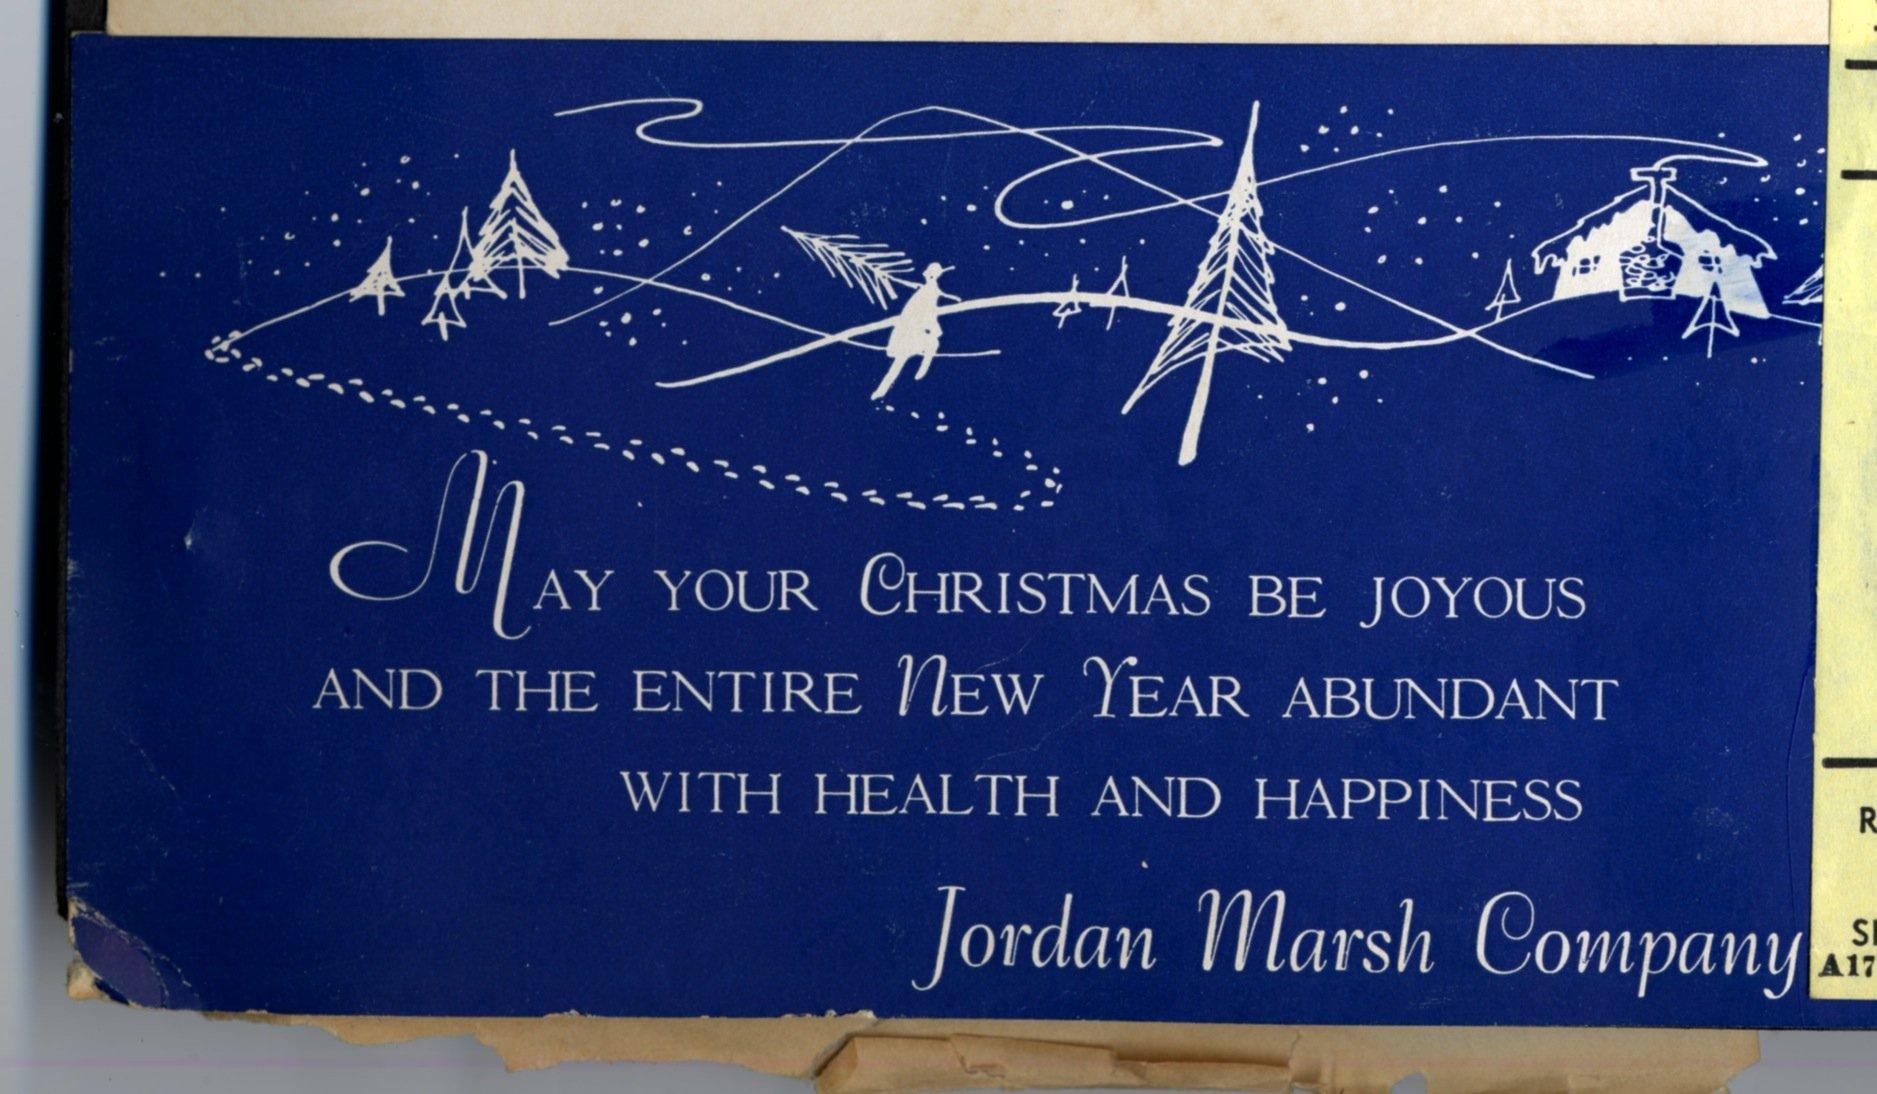 Christmas card photo creator xmast 1 edith hornik beer digital scrapbook jordan marsh company m4hsunfo